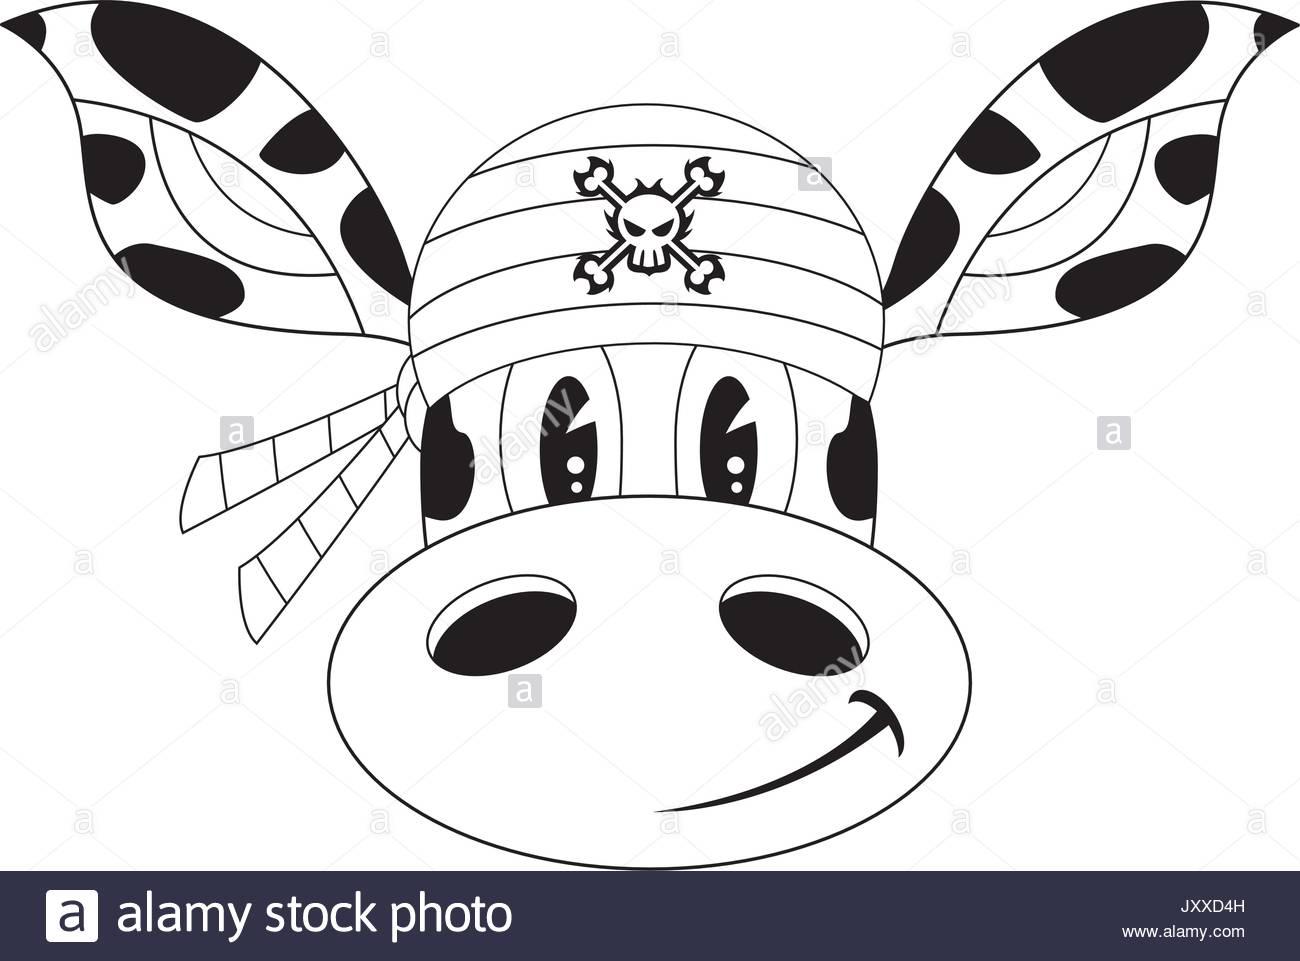 1300x961 Cute Cartoon Giraffe Pirate Crewman In Bandana Line Drawing Stock